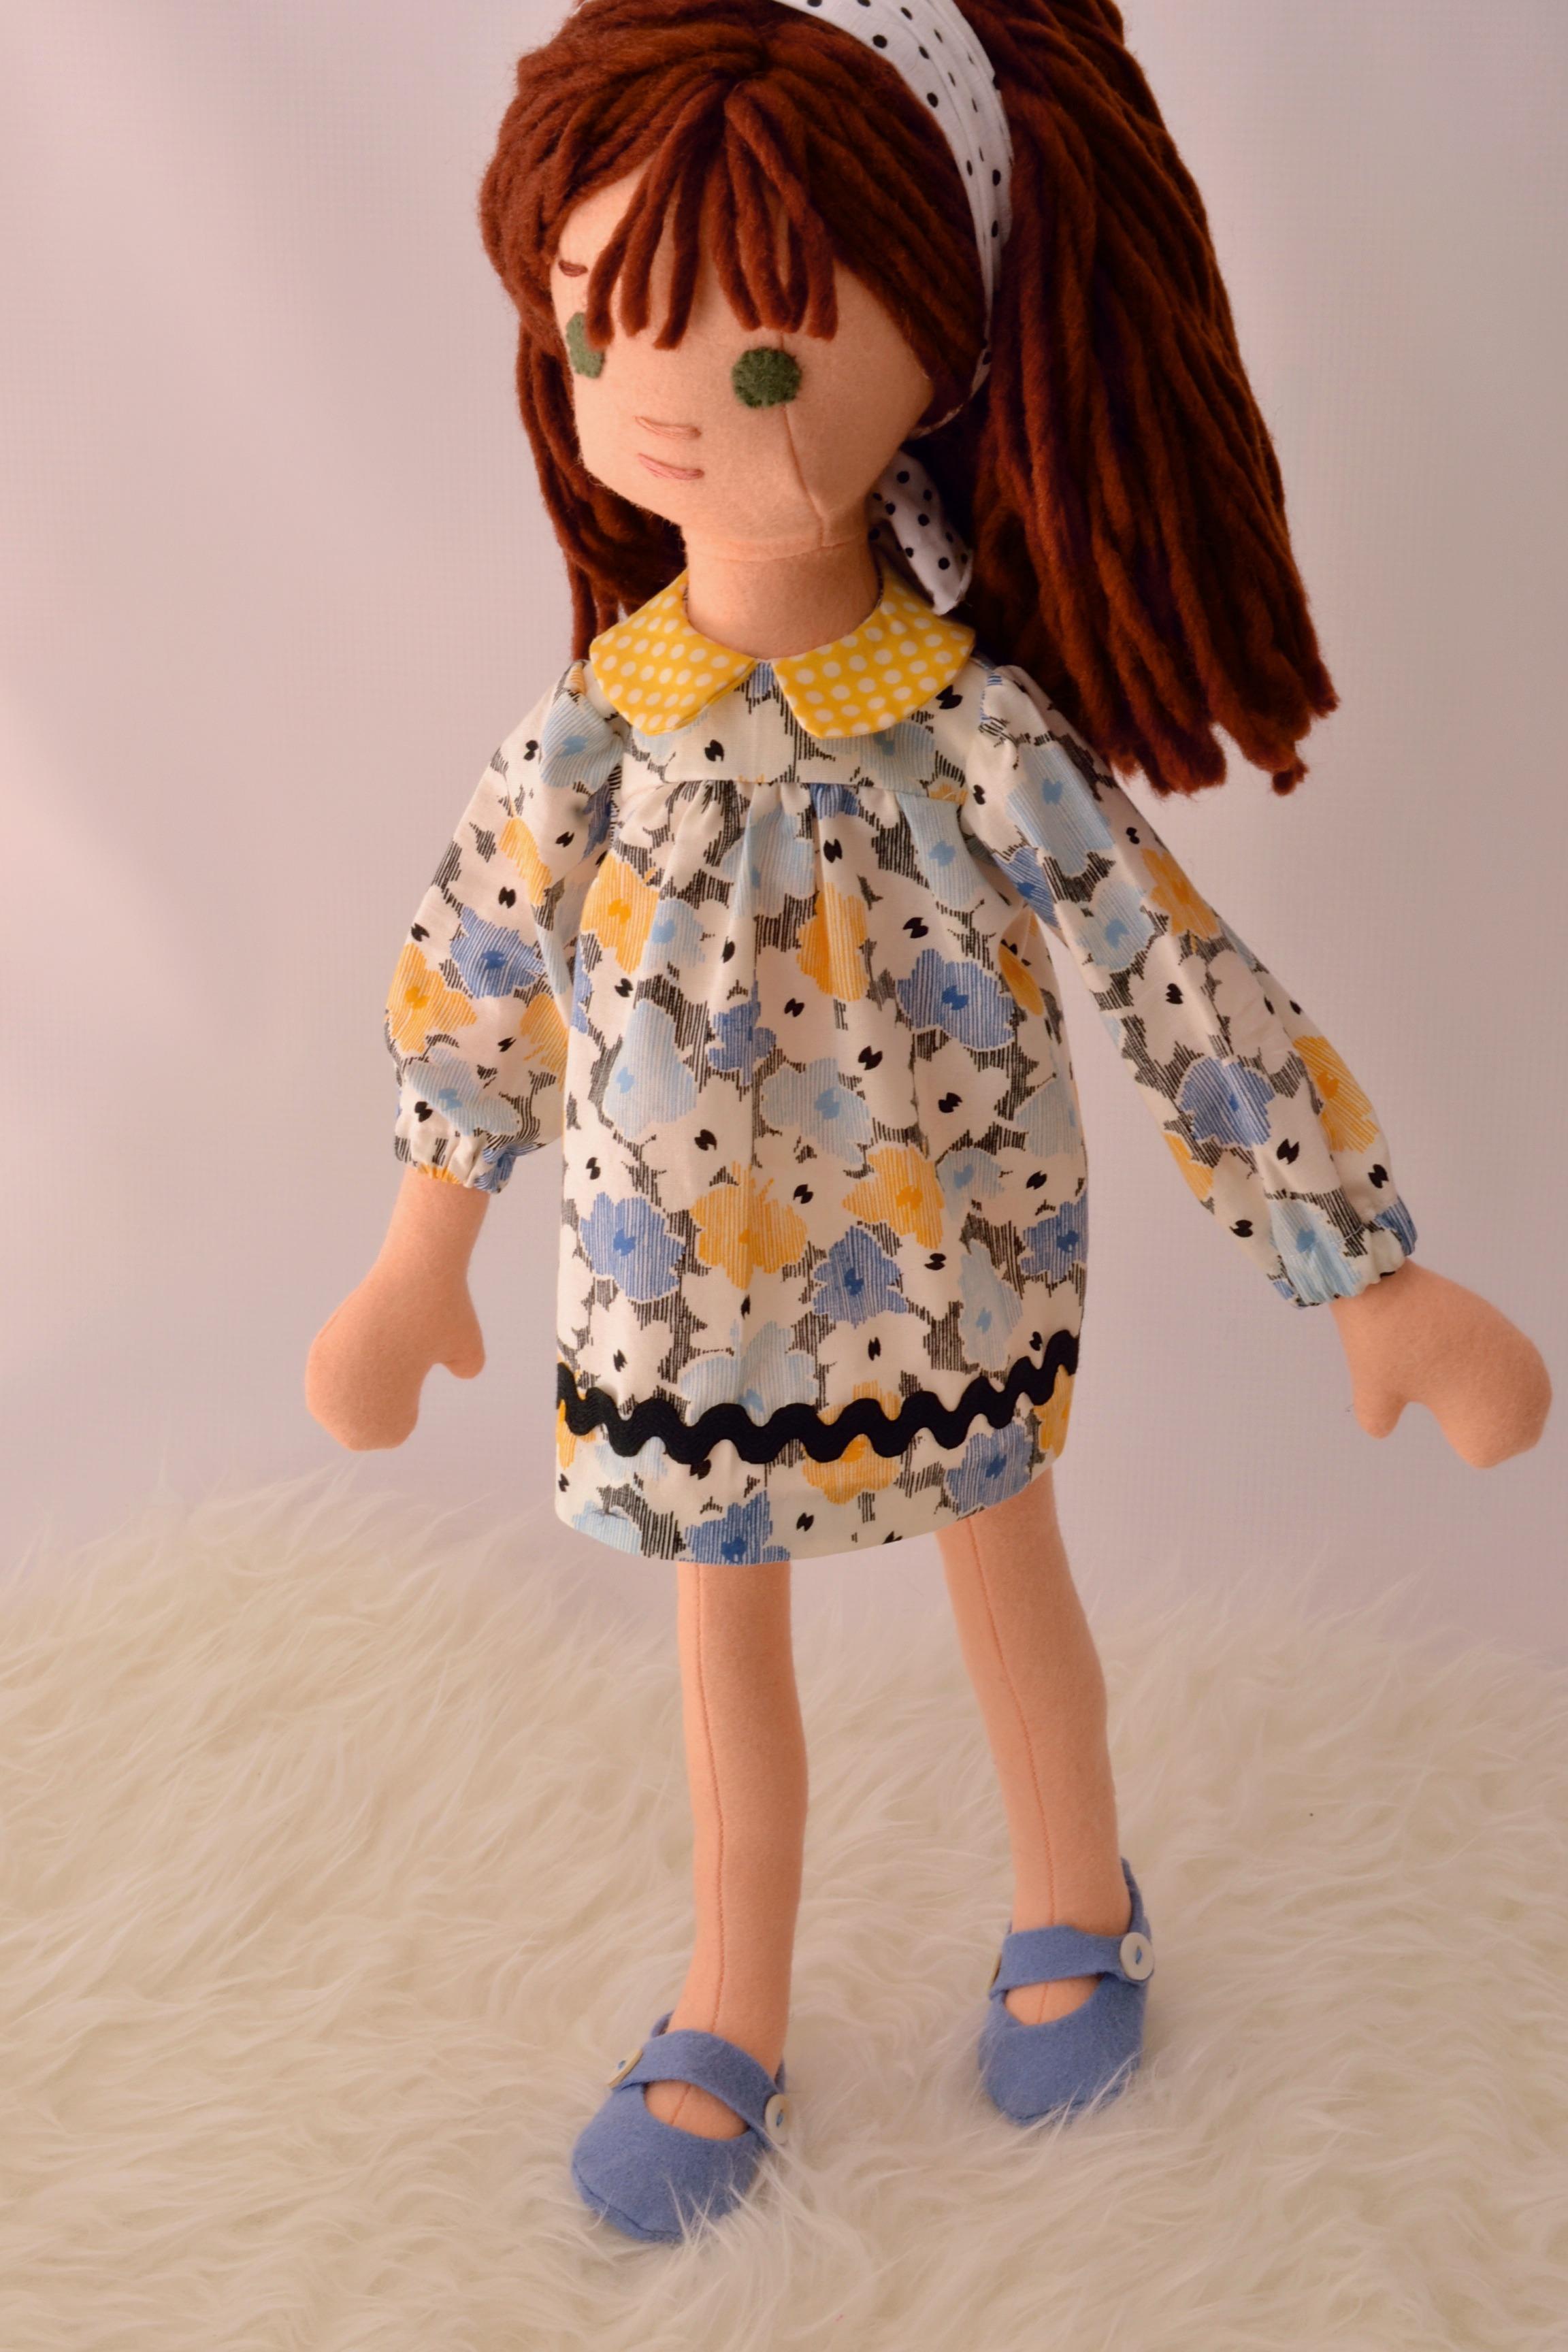 A custom Phoebe Doll